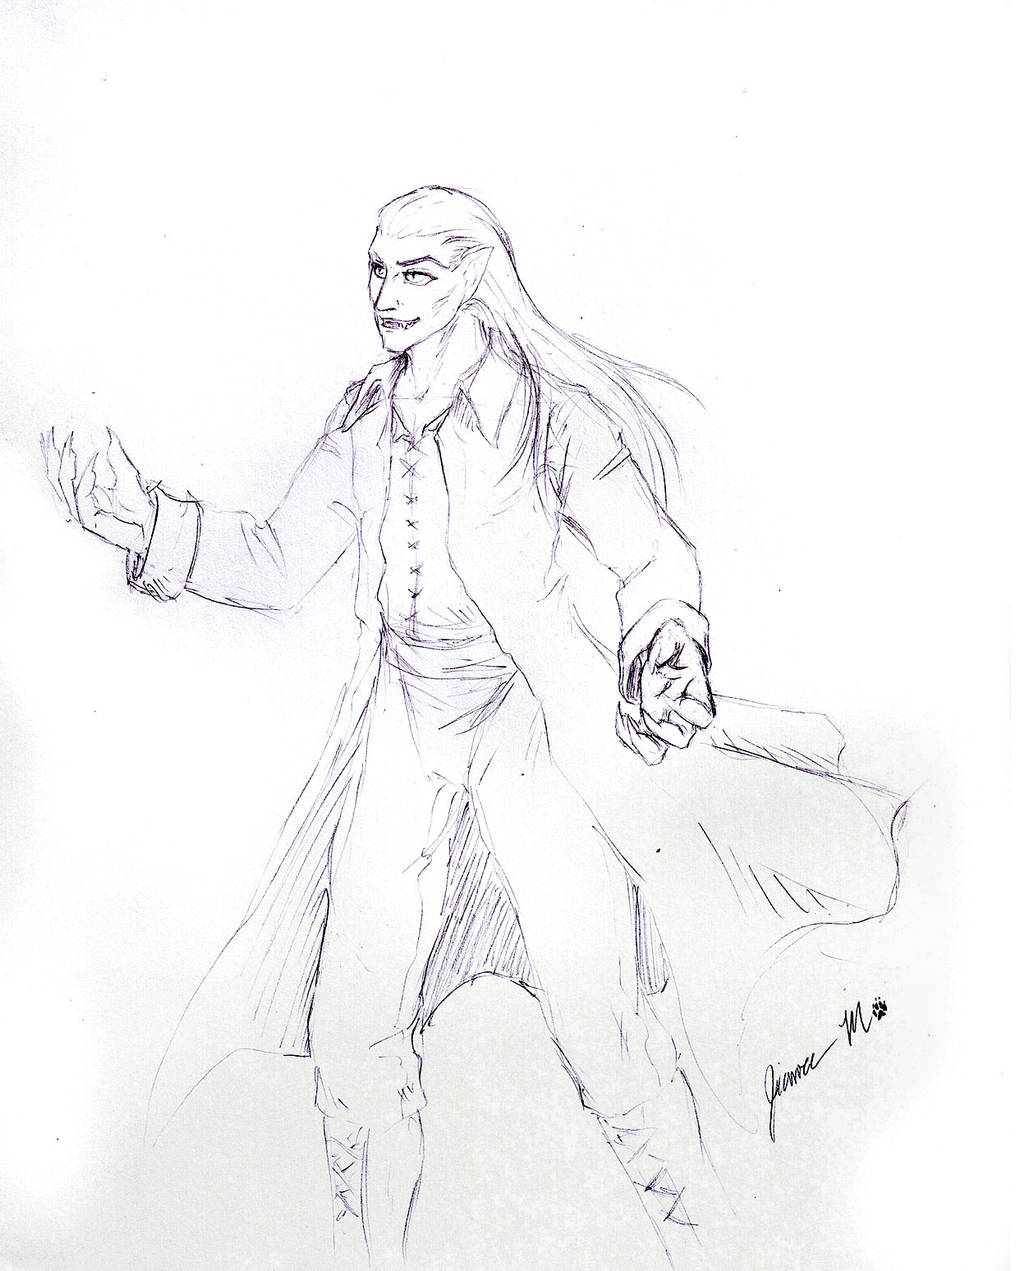 Sketch Request - vampire by Jianre-M